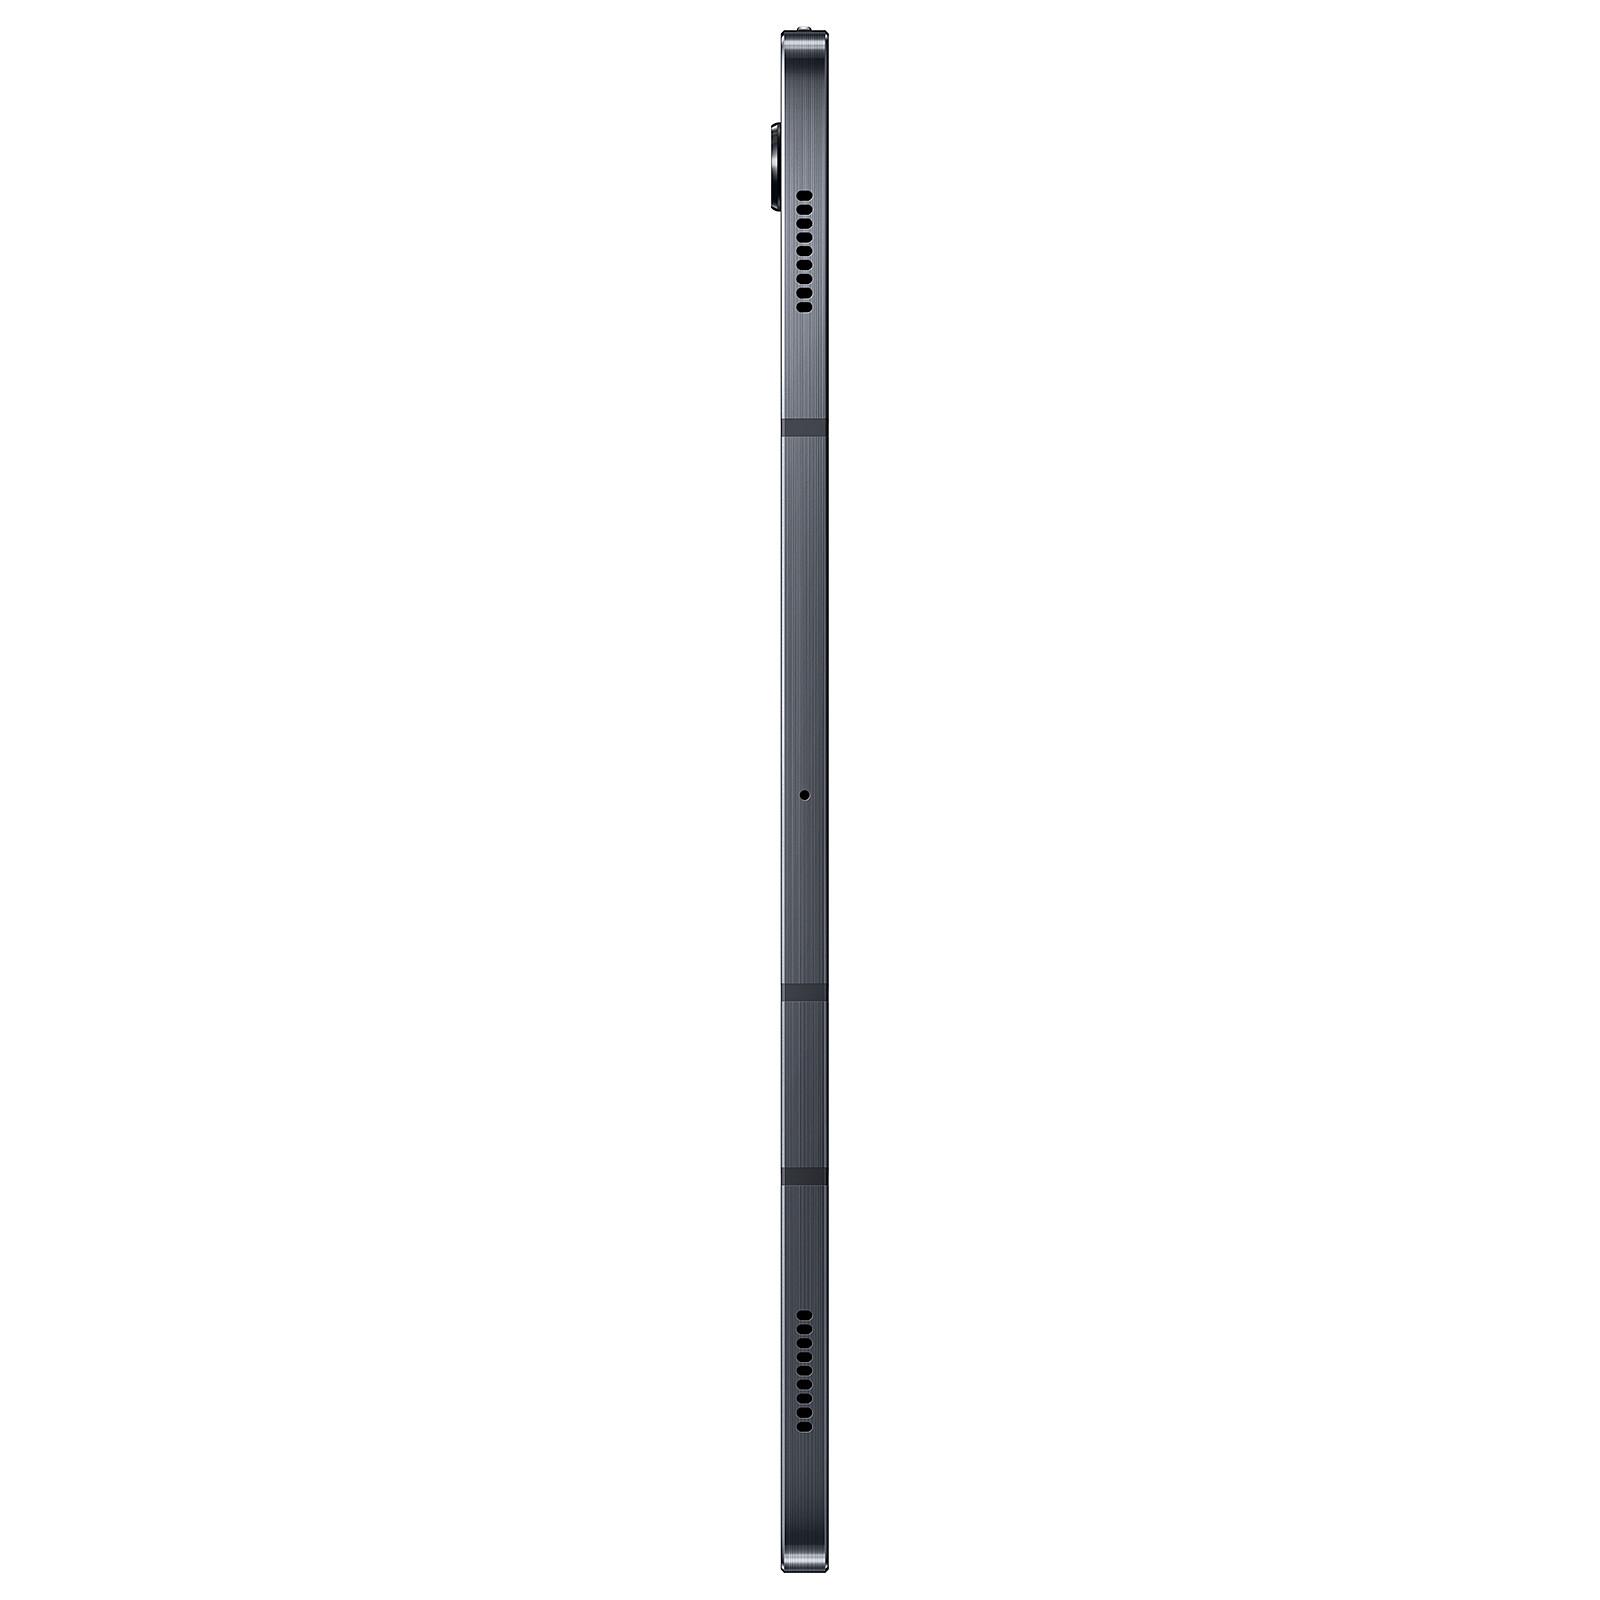 Samsung Galaxy TAB S7+ T970NZK Noir - Tablette tactile Samsung - 2